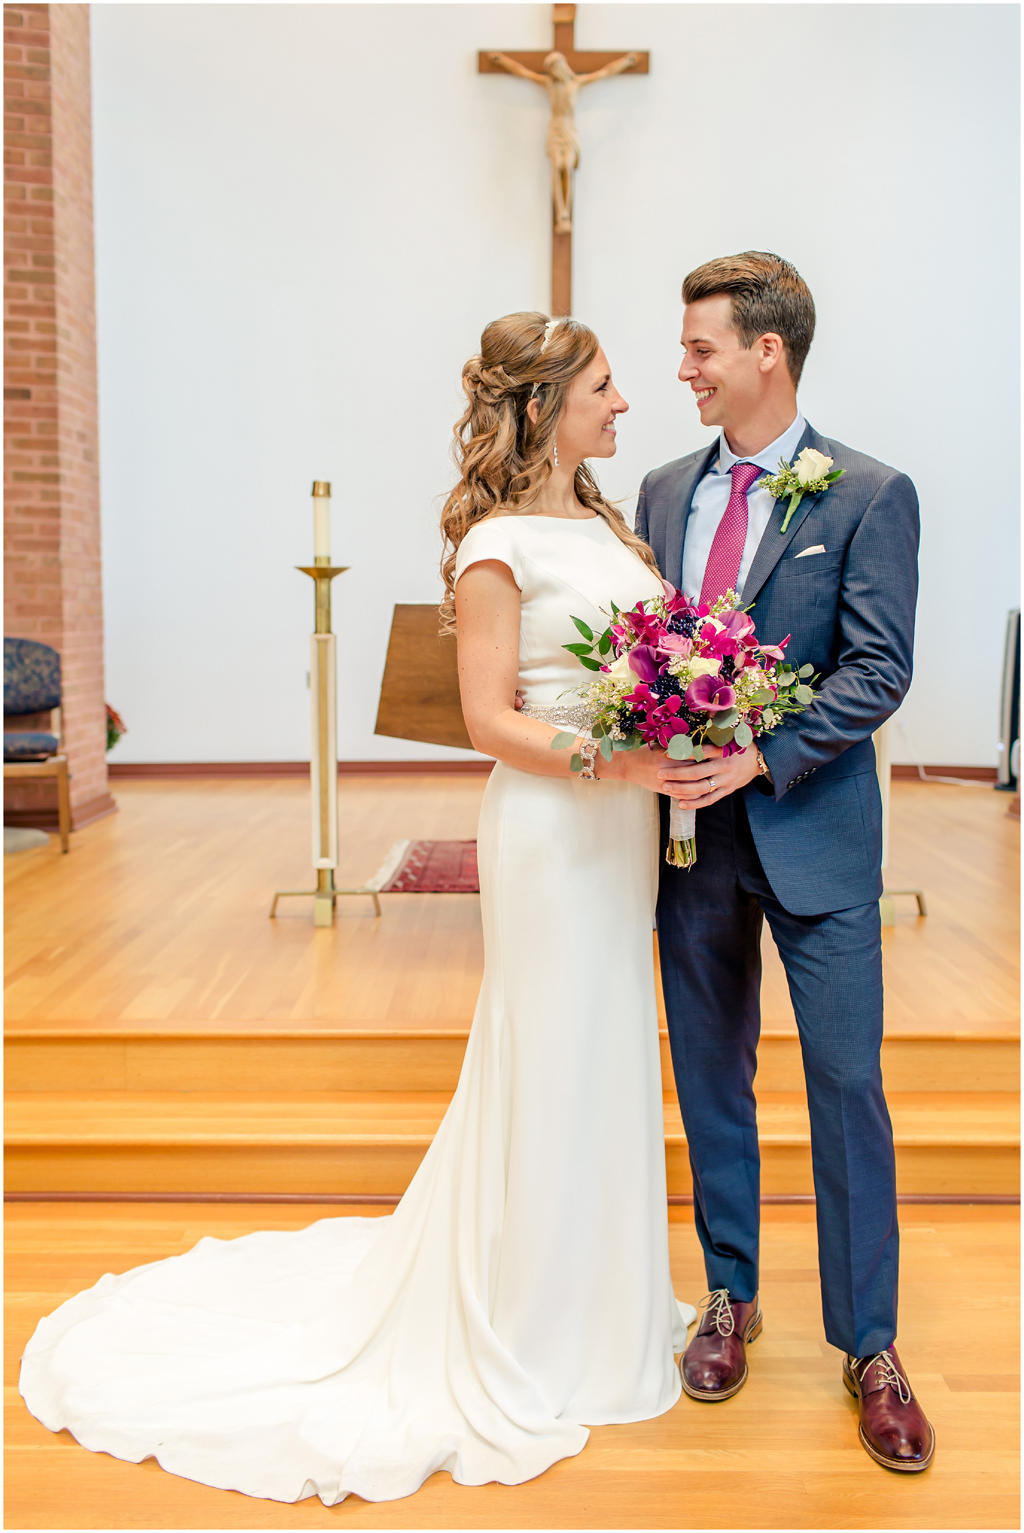 ritz-carlton-georgetown-wedding-washington-dc-photography-liz-stewart-photo-00026